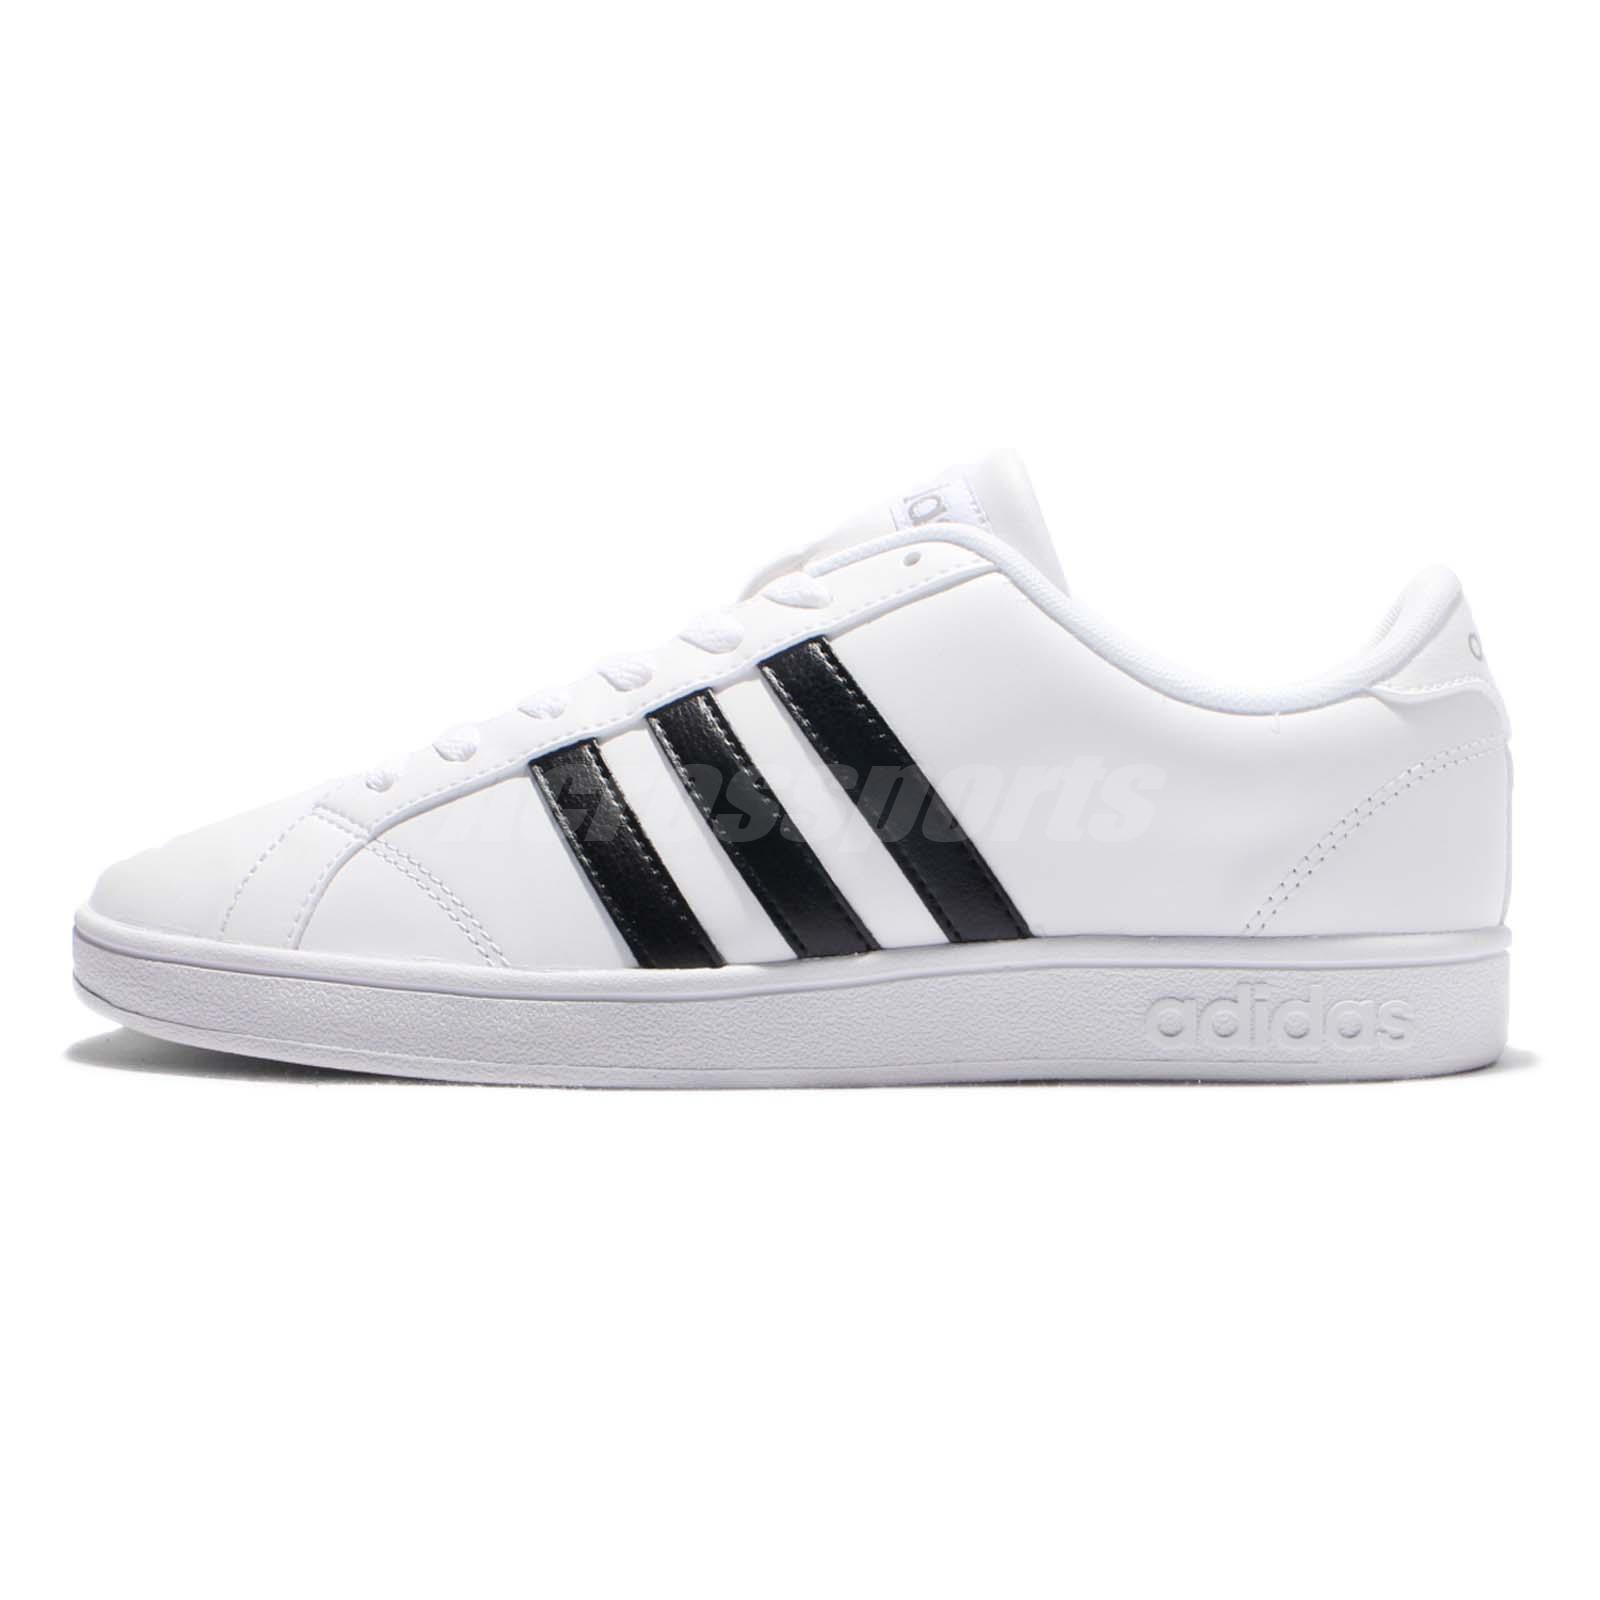 adidas neo label baseline white black mens casual shoes. Black Bedroom Furniture Sets. Home Design Ideas